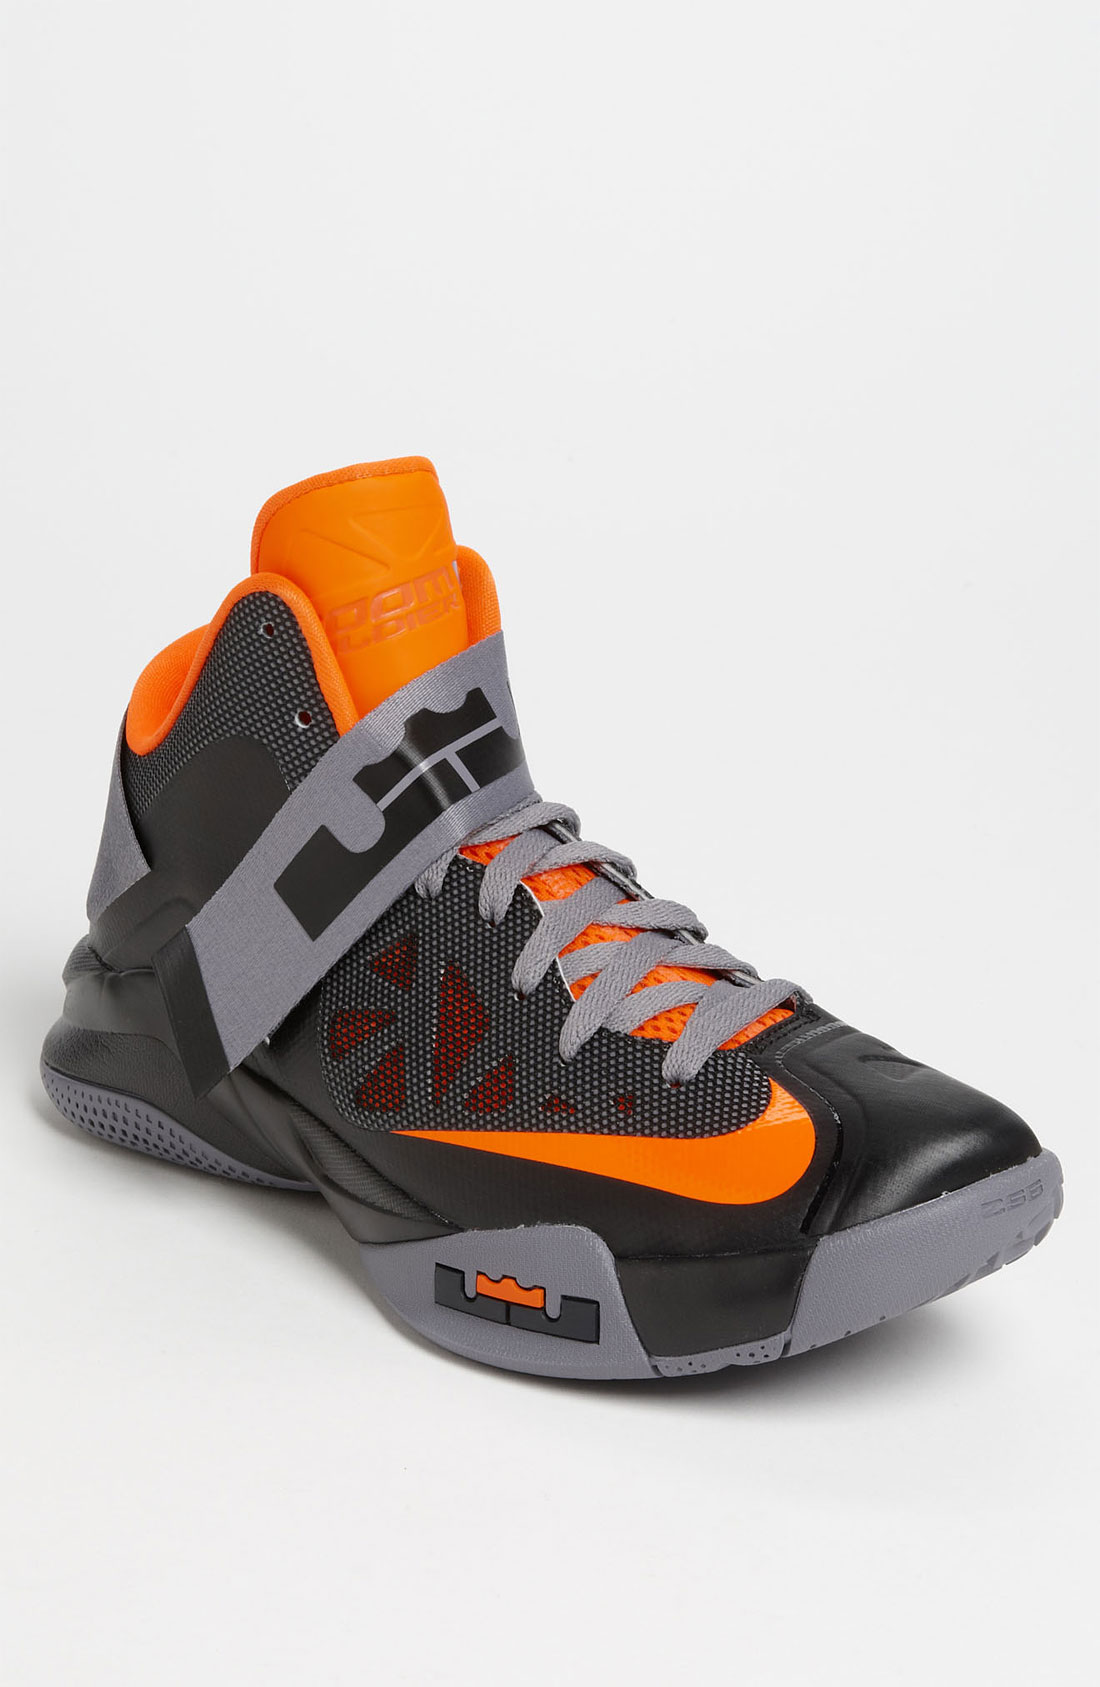 nike basketball shoes orange and black